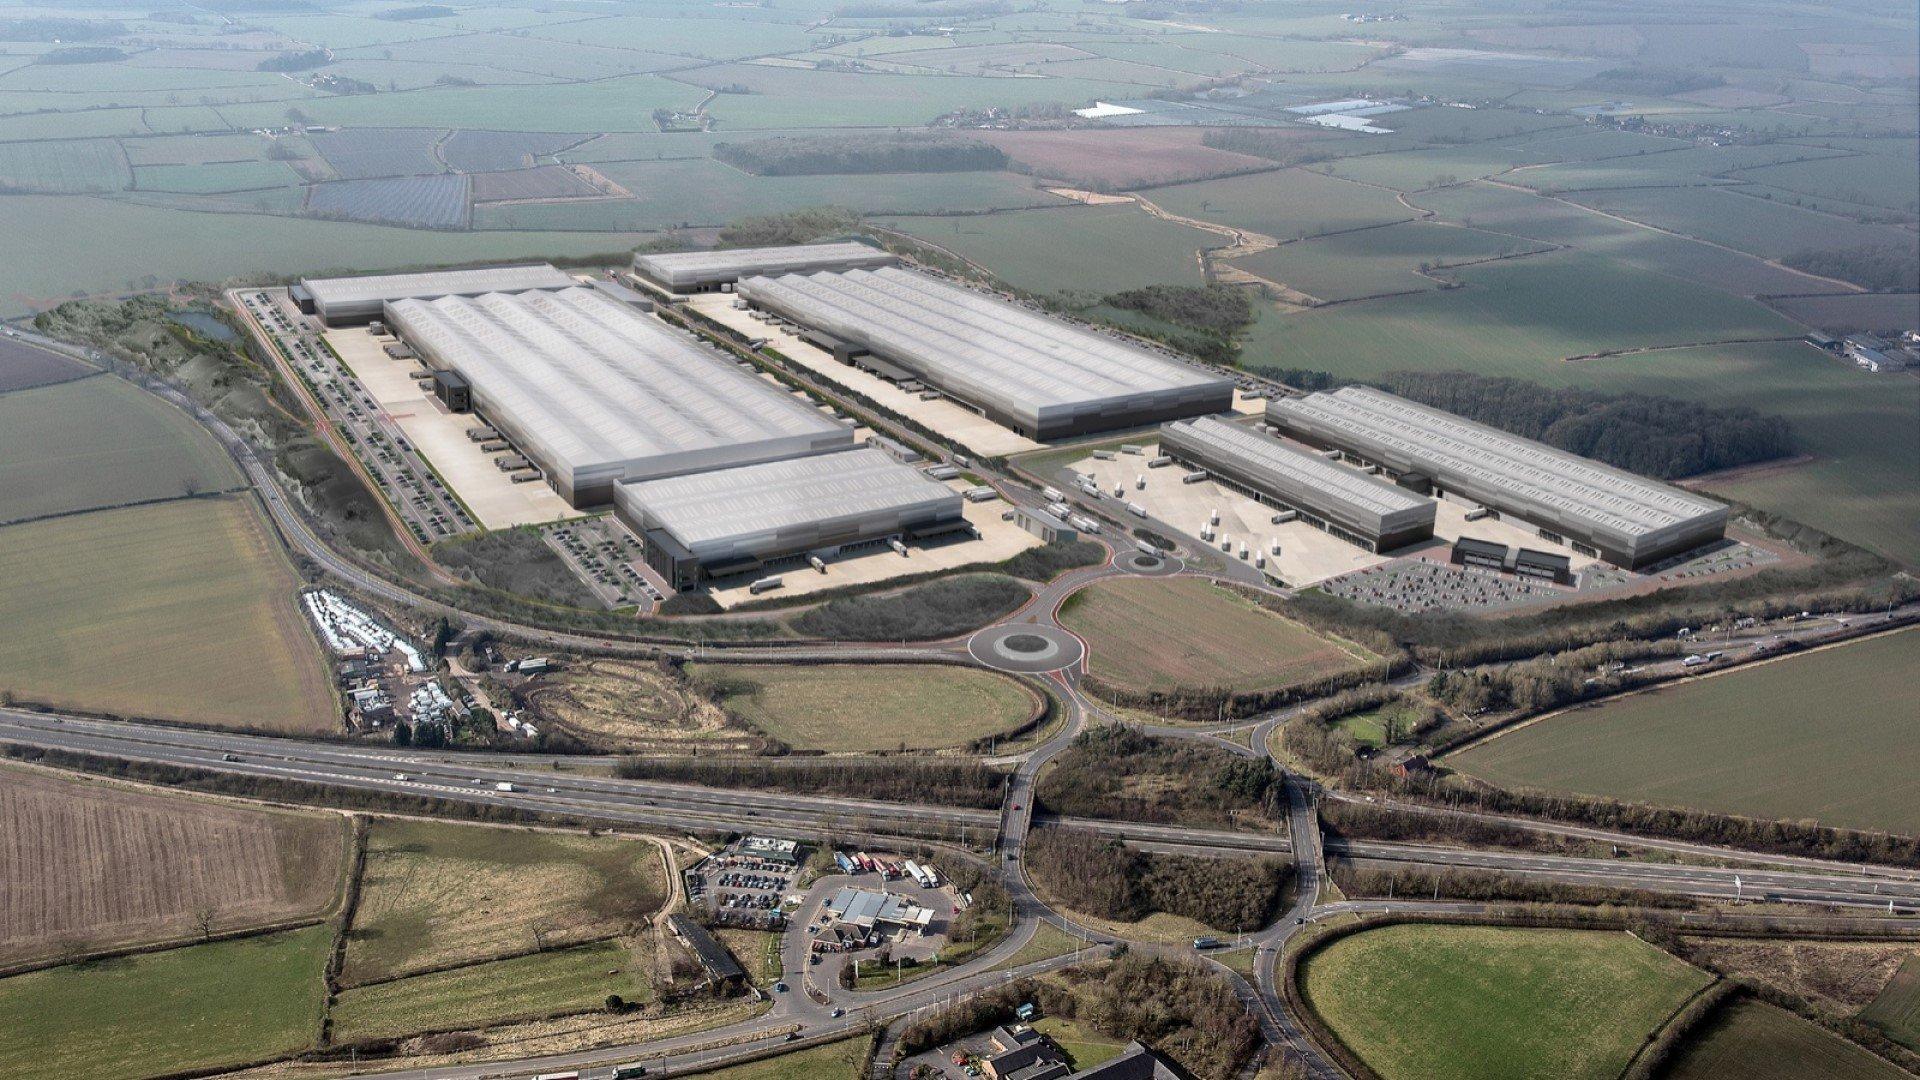 Unipart wins five-year Jaguar Land Rover contract. CGI of the new Jaguar Land Rover Global Parts Logistics Centre